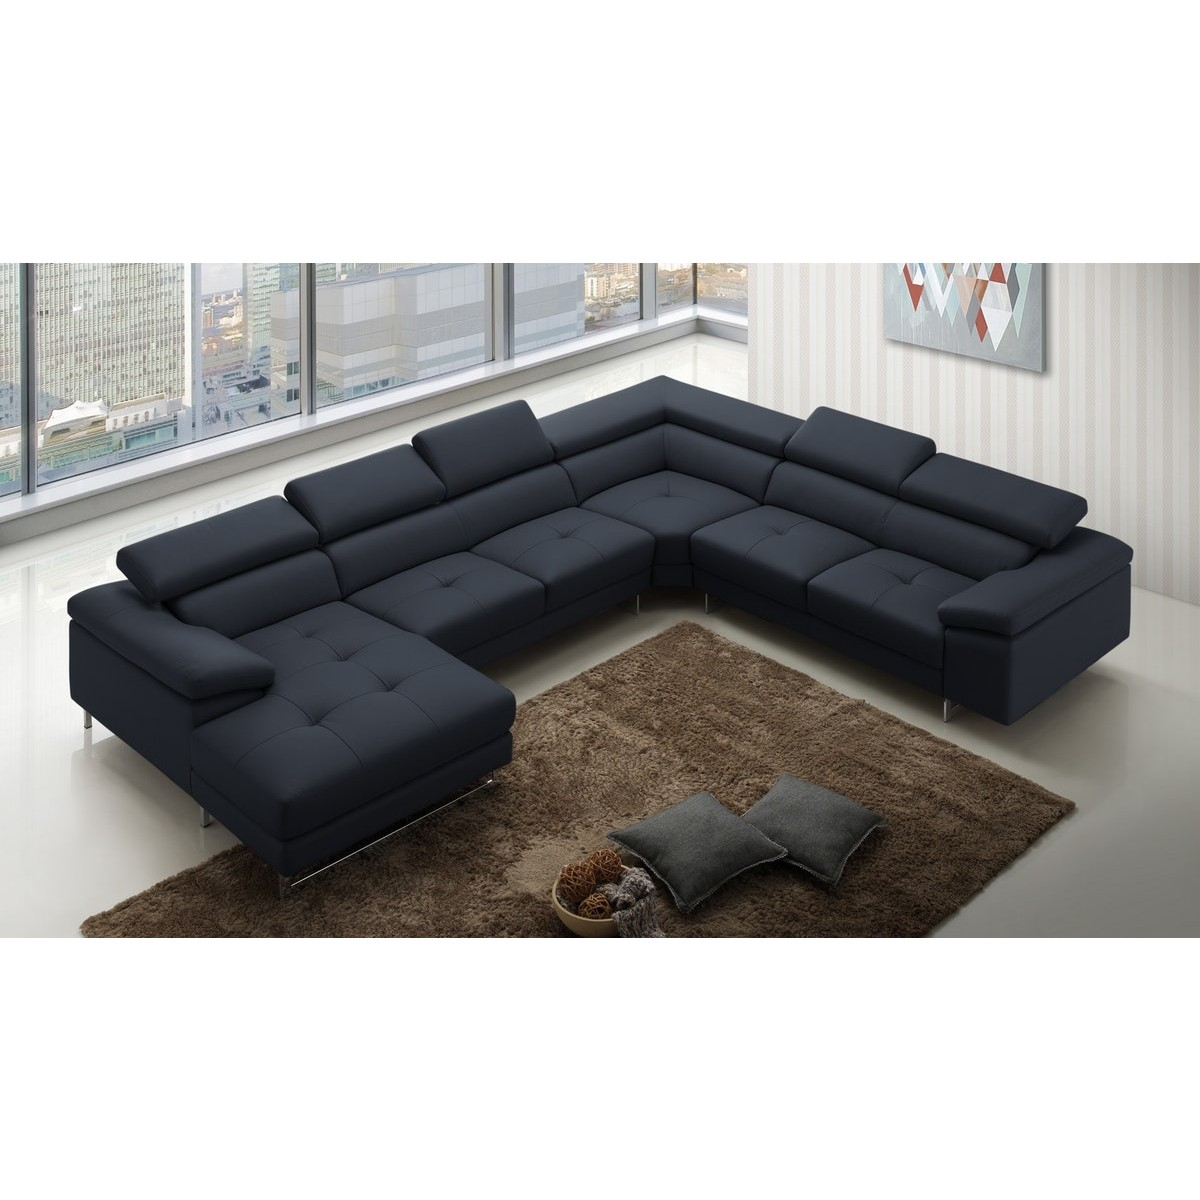 canap panoramique en cuir moss canap s en u panoramiques en cuir canap s. Black Bedroom Furniture Sets. Home Design Ideas